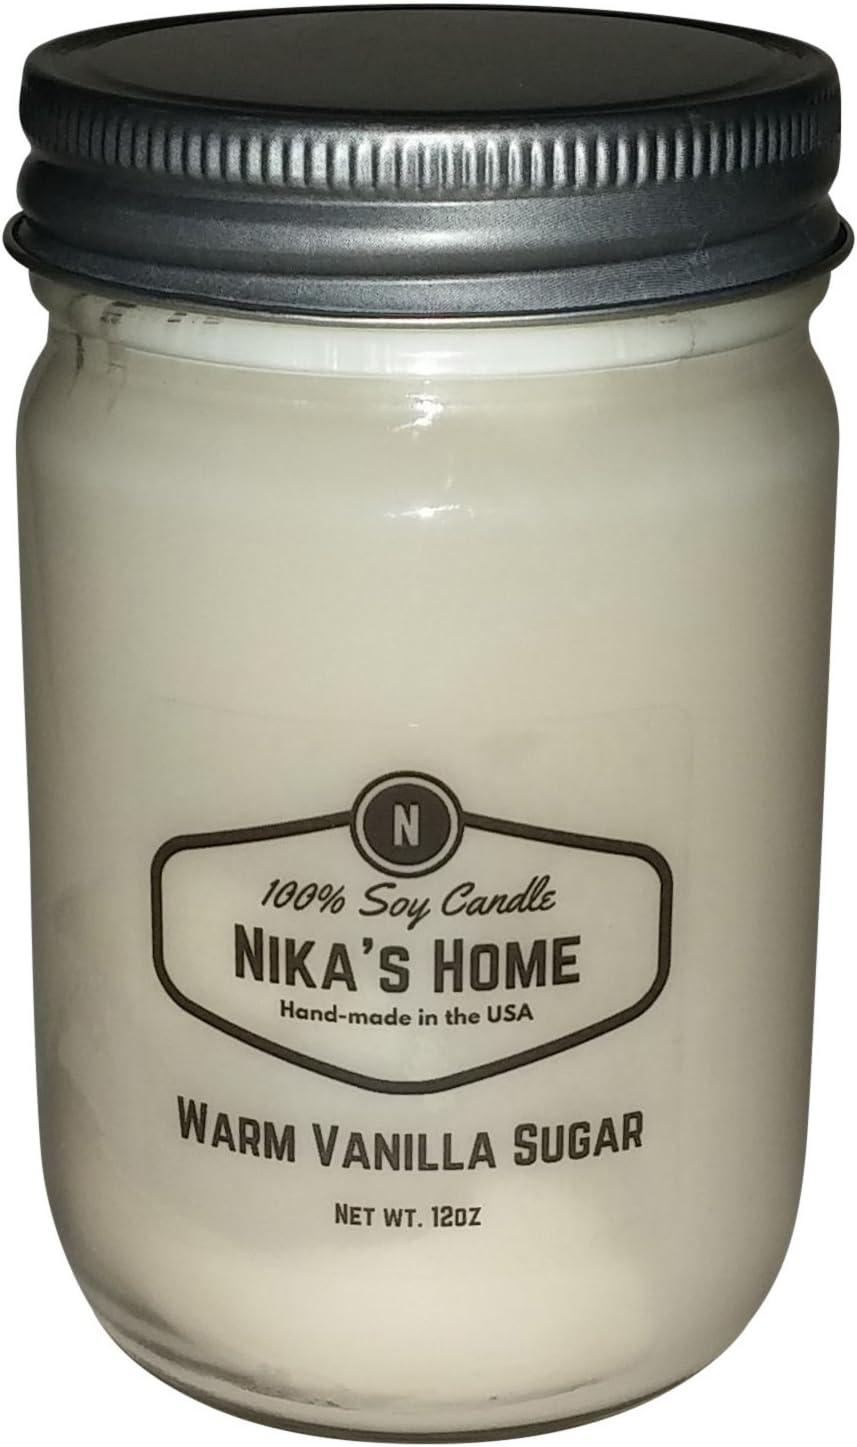 Nika's Home Warm Vanilla Sugar Soy Candle - 12oz Mason